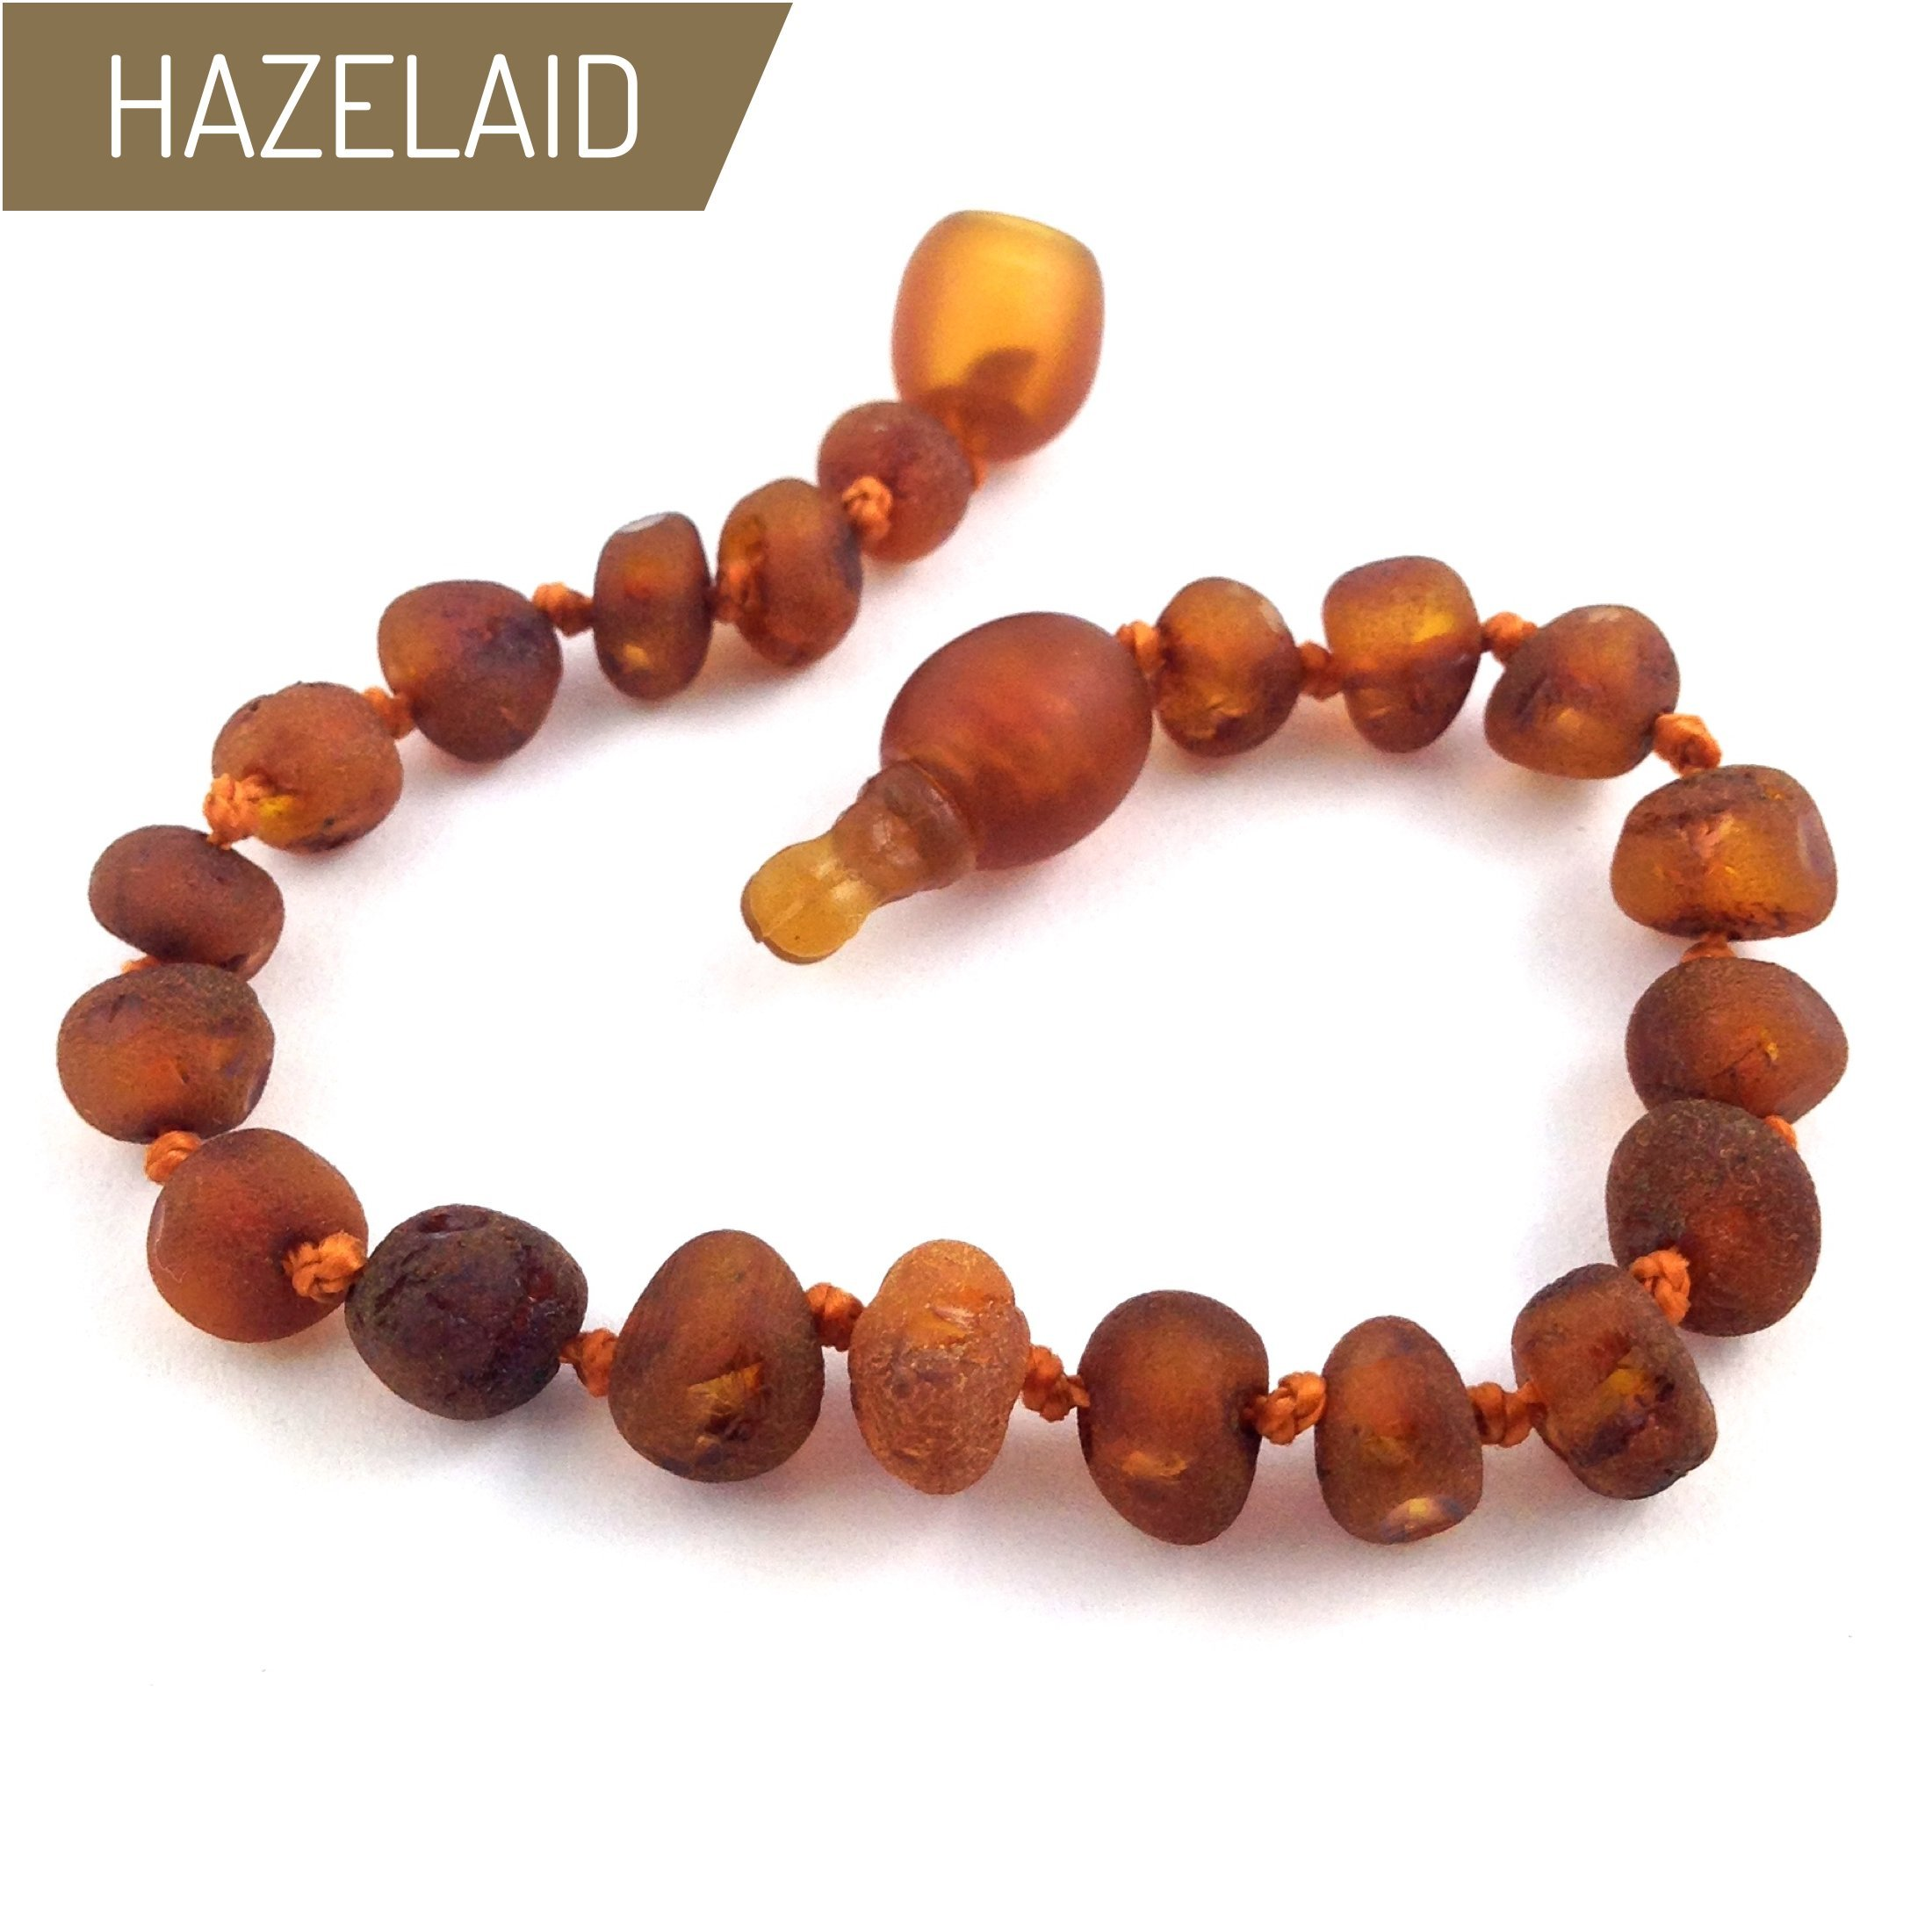 Hazelaid (TM) 5.5'' Pop-Clasp Baltic Amber Nutmeg Bracelet